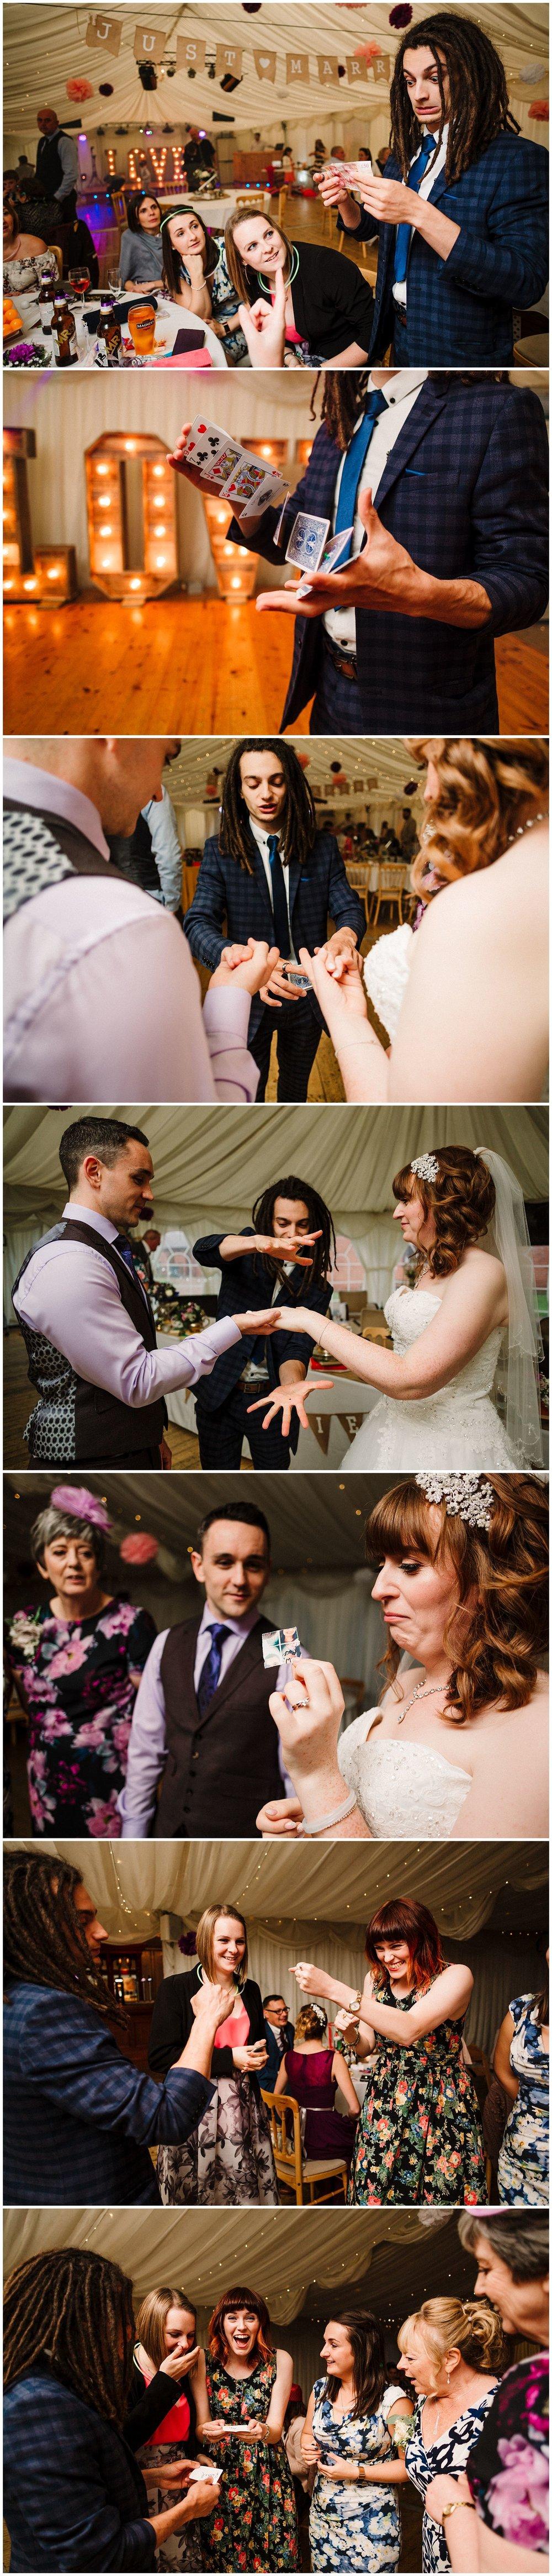 a close up magician at a yorkshire wedding reception